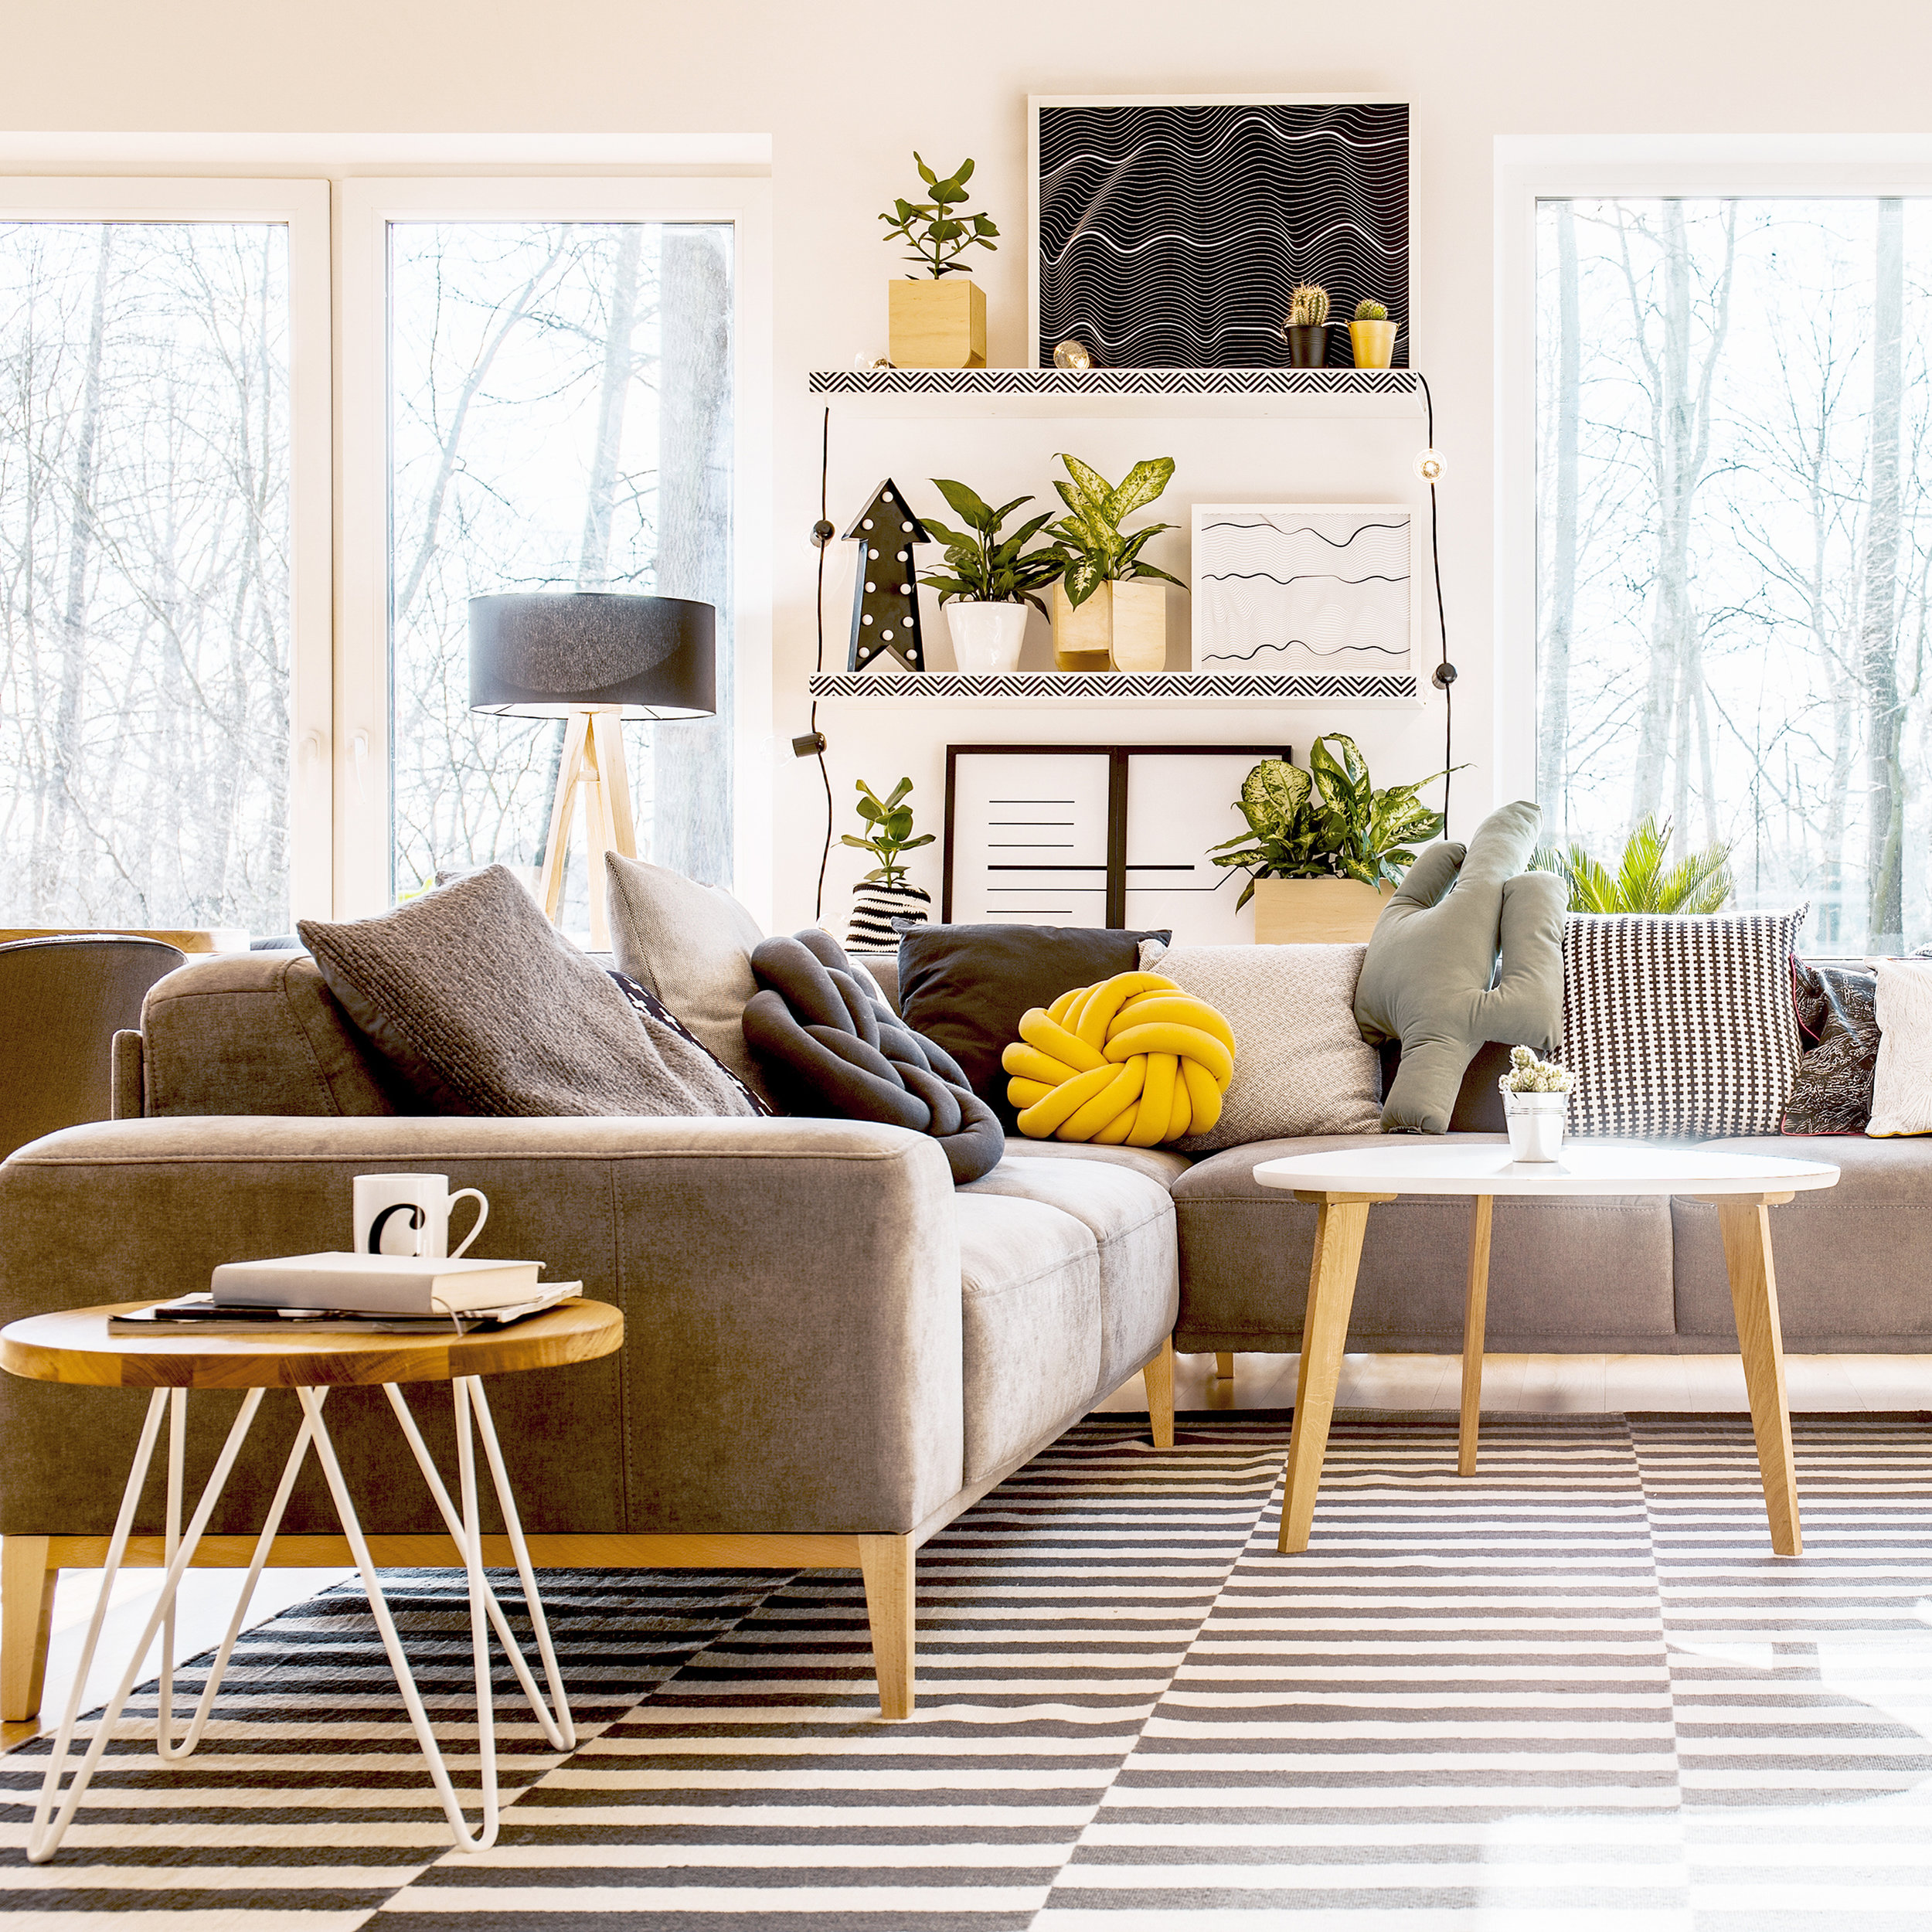 catherine-schellenberg-real-estate-team-winnipeg-realtor-mark-wiebe-re:max-professionals-buying-a-home.jpg